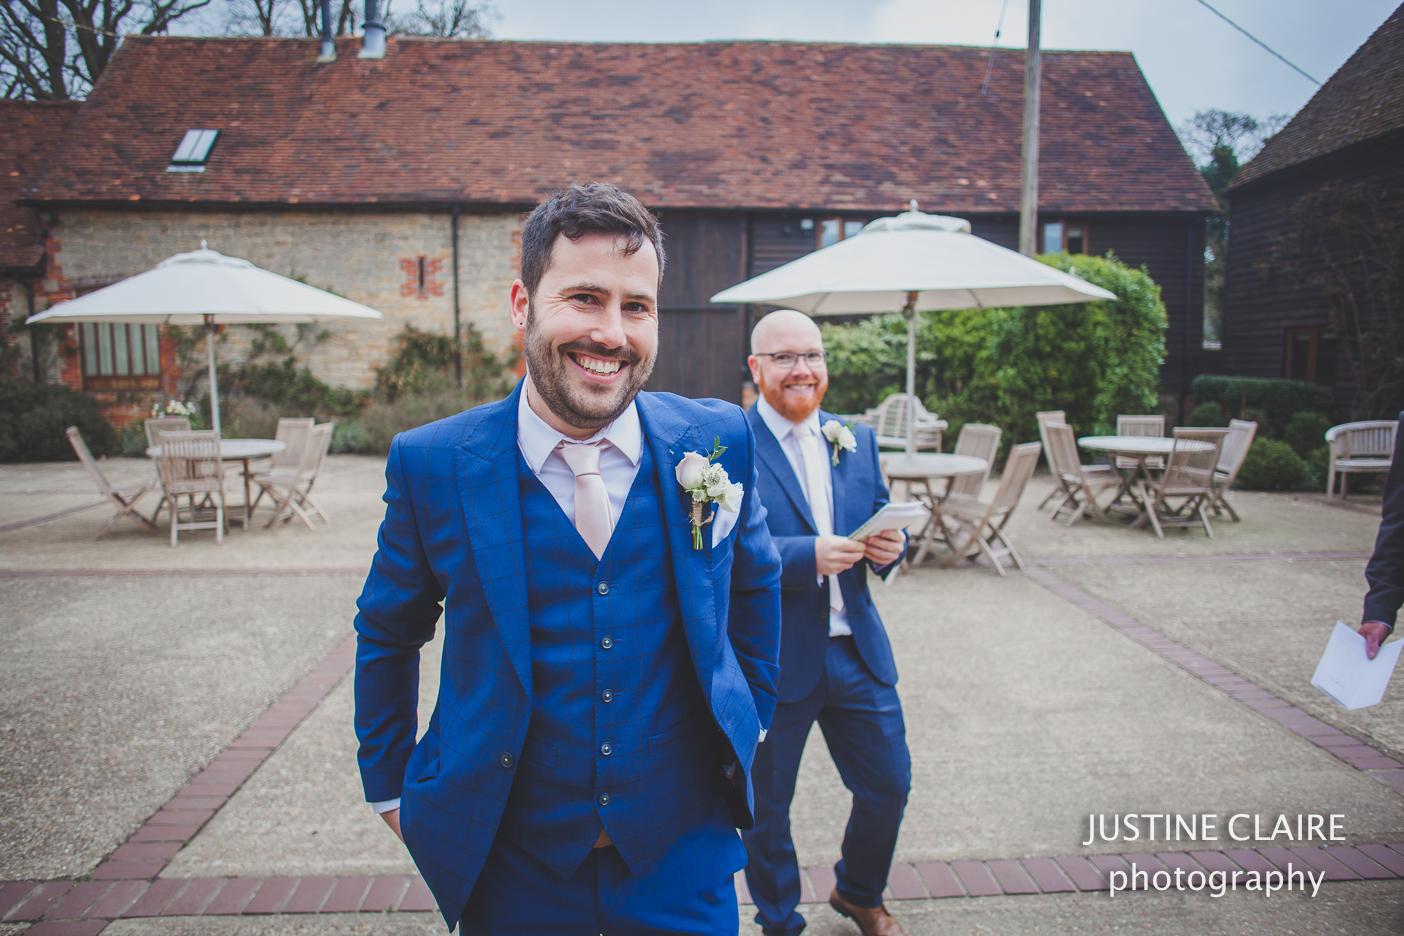 Fitzleroi Fittleworth petworth Billingshurst farm Wedding Photography by Justine Claire photographer Arundel Worthing Brighton-14.jpg